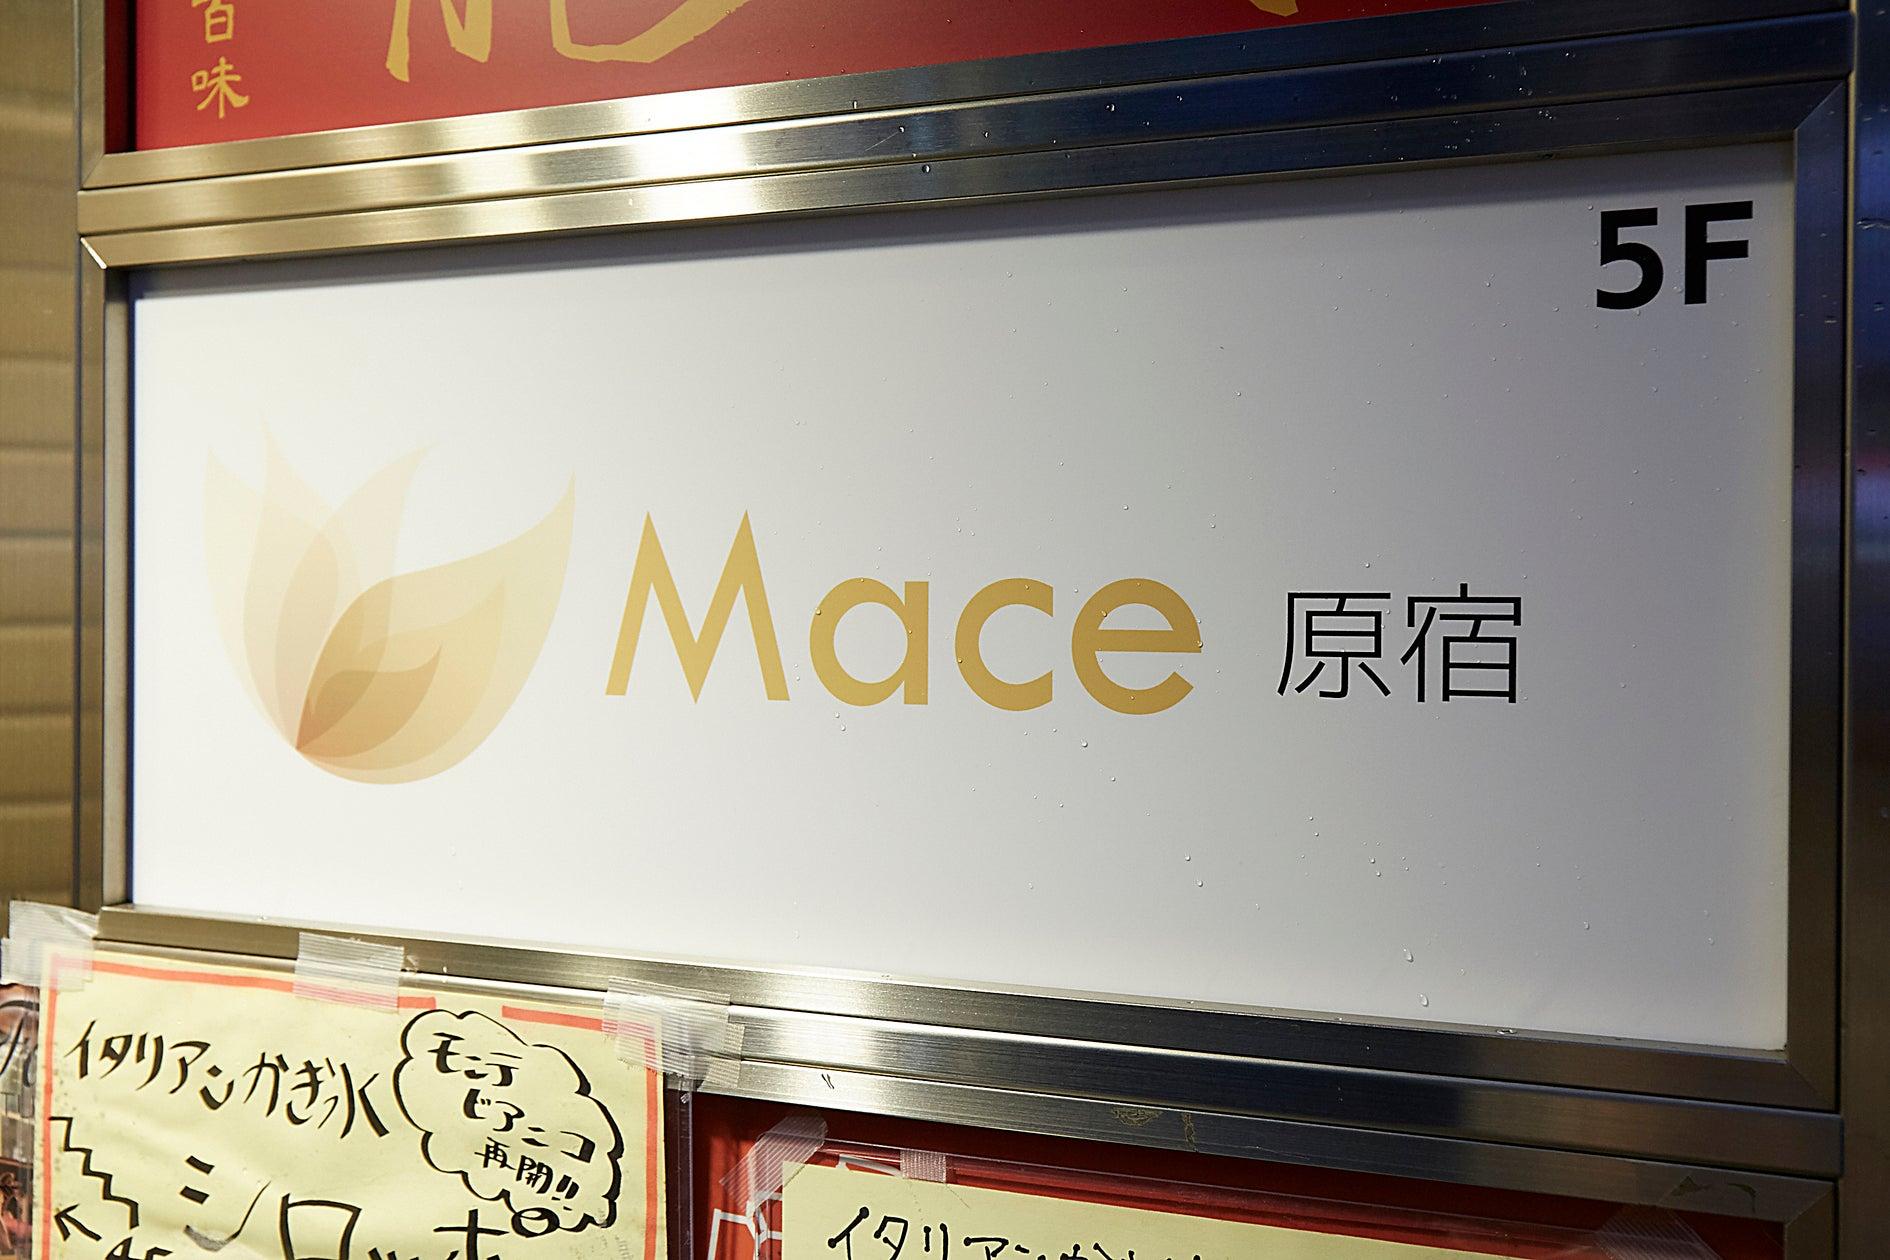 Mace原宿【竹下通り出口に位置する砂浜カフェ風スペース!】 の写真